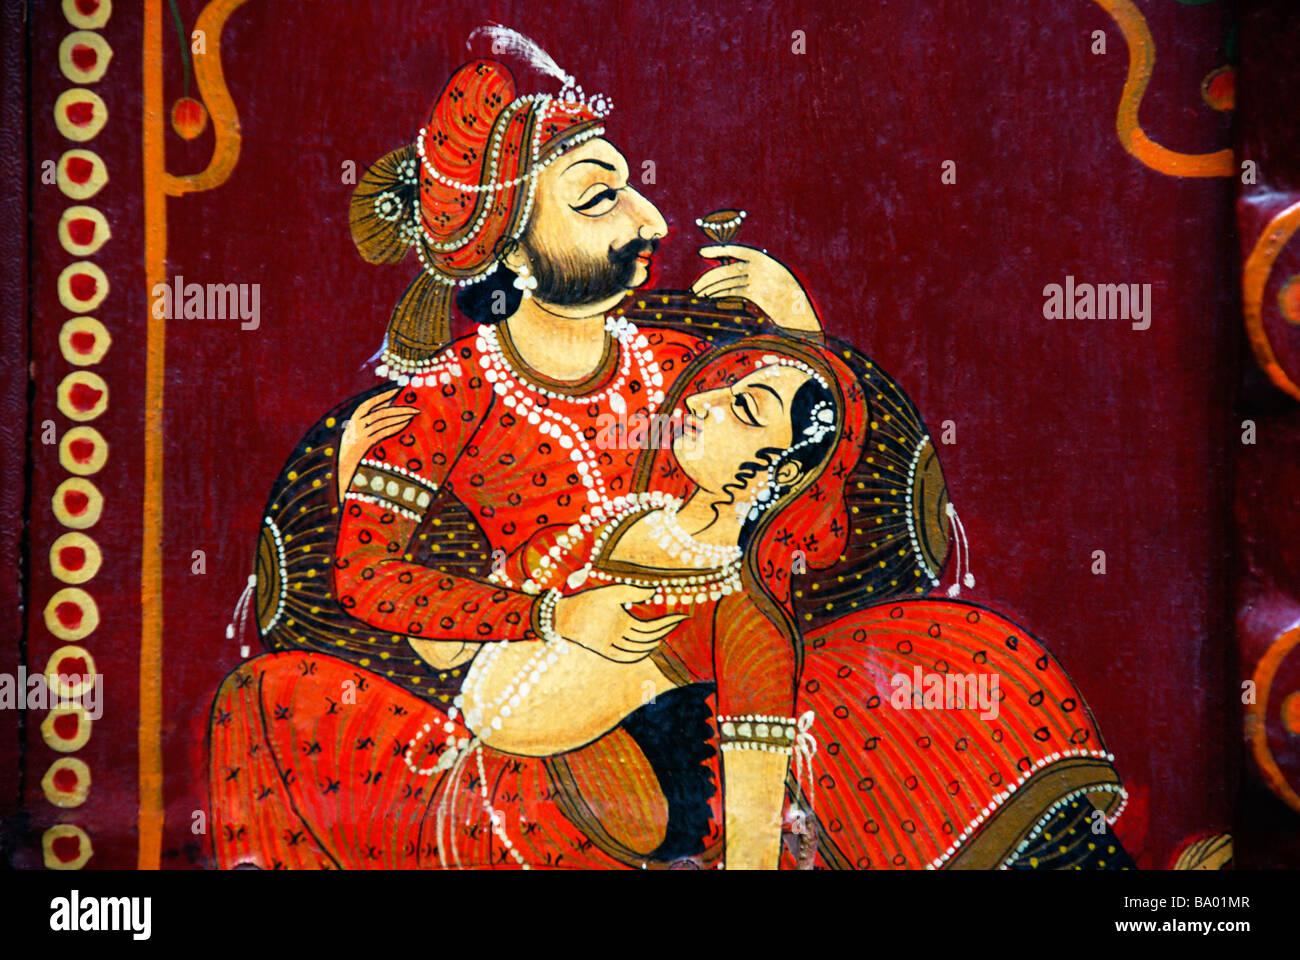 Fenêtre sur la peinture du Rajasthan, Rajasthan, Inde. Photo Stock